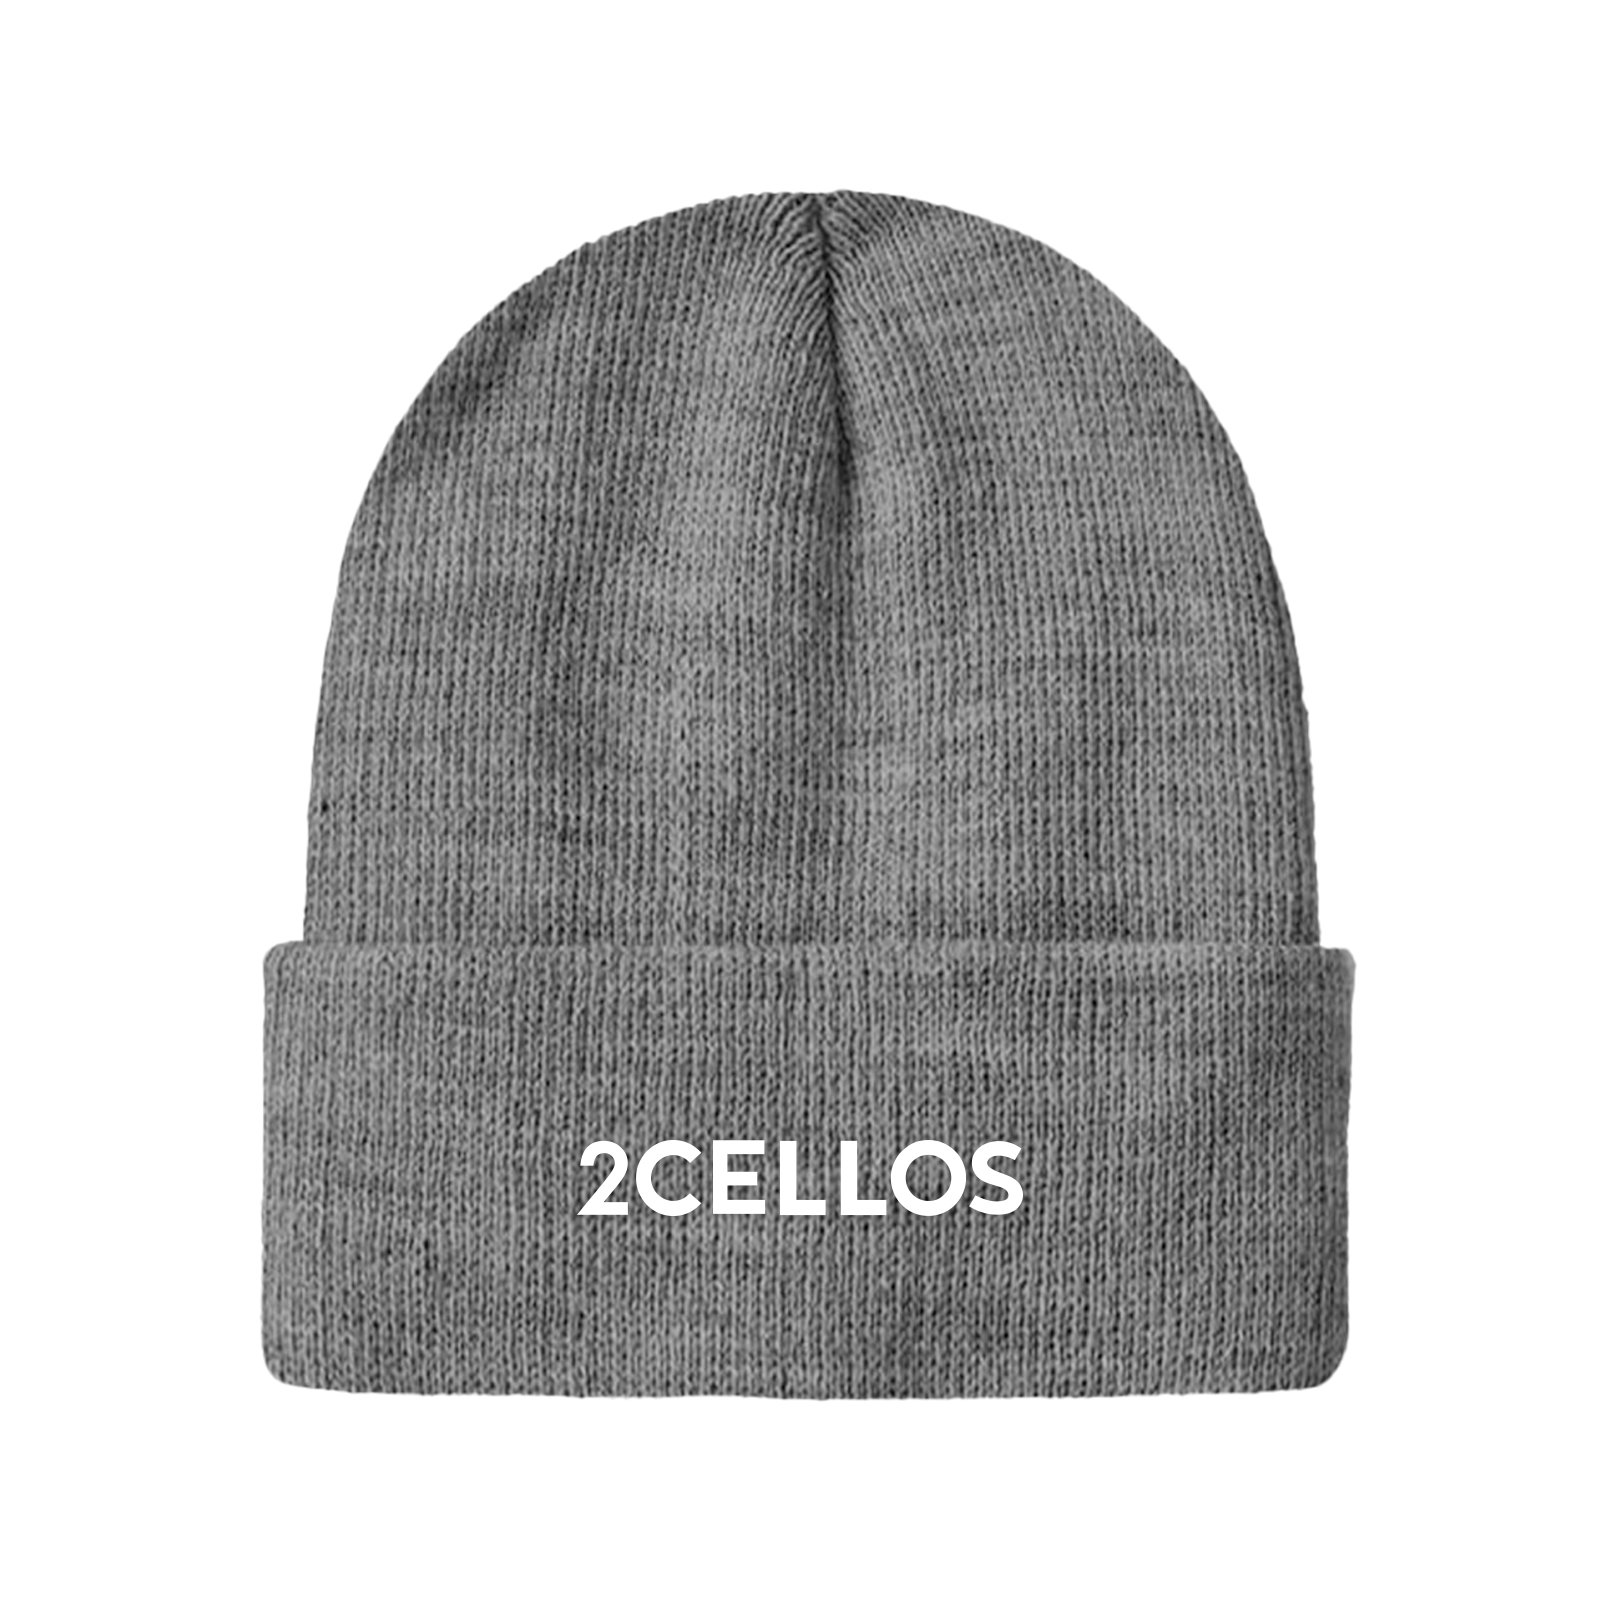 Buy Online 2 Cellos - 2CELLOS Grey Beanie